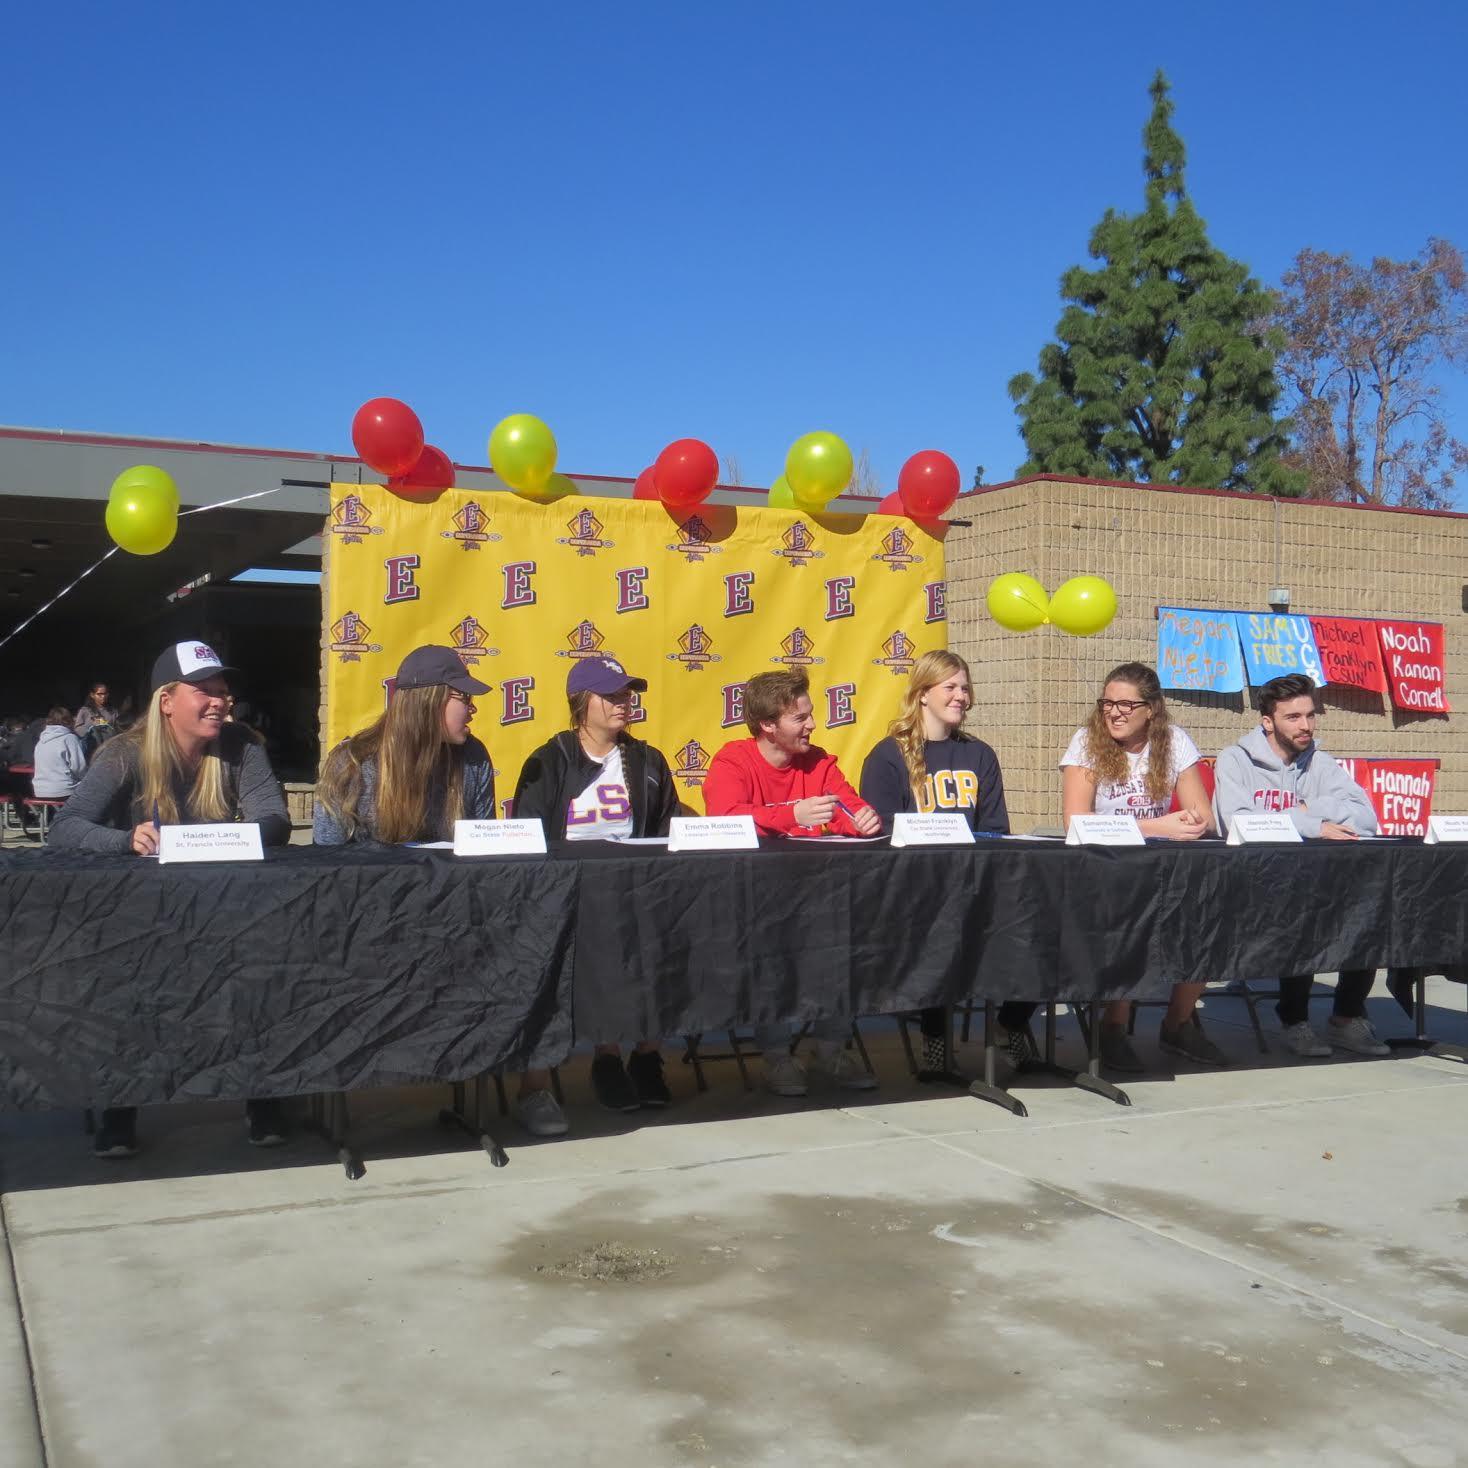 Haiden Lang, Megan Nieto, Emma Robbins, Micheal Franklyn, Samantha Fries, Hannah Frey, and Noah Kanan celebrating their signing day for their athletic accomplishments.